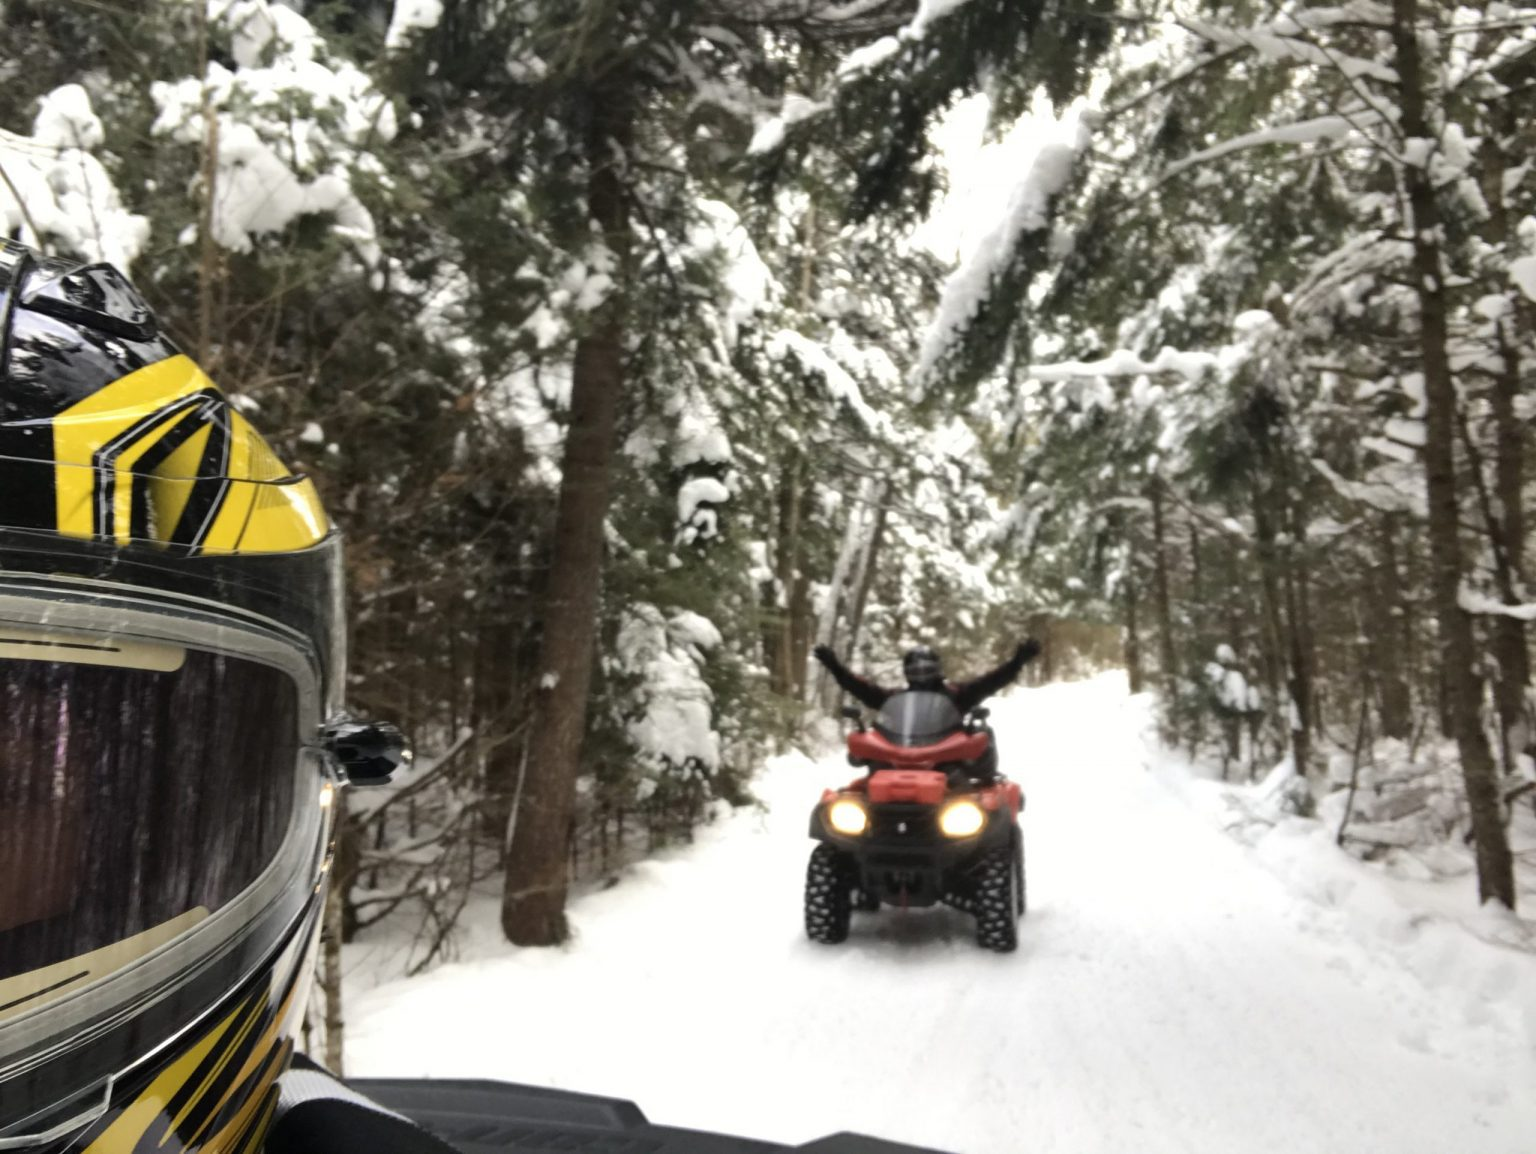 Saison hivernale de quad|Saison hivernale de quad|Saison hivernale de quad|Saison hivernale de quad